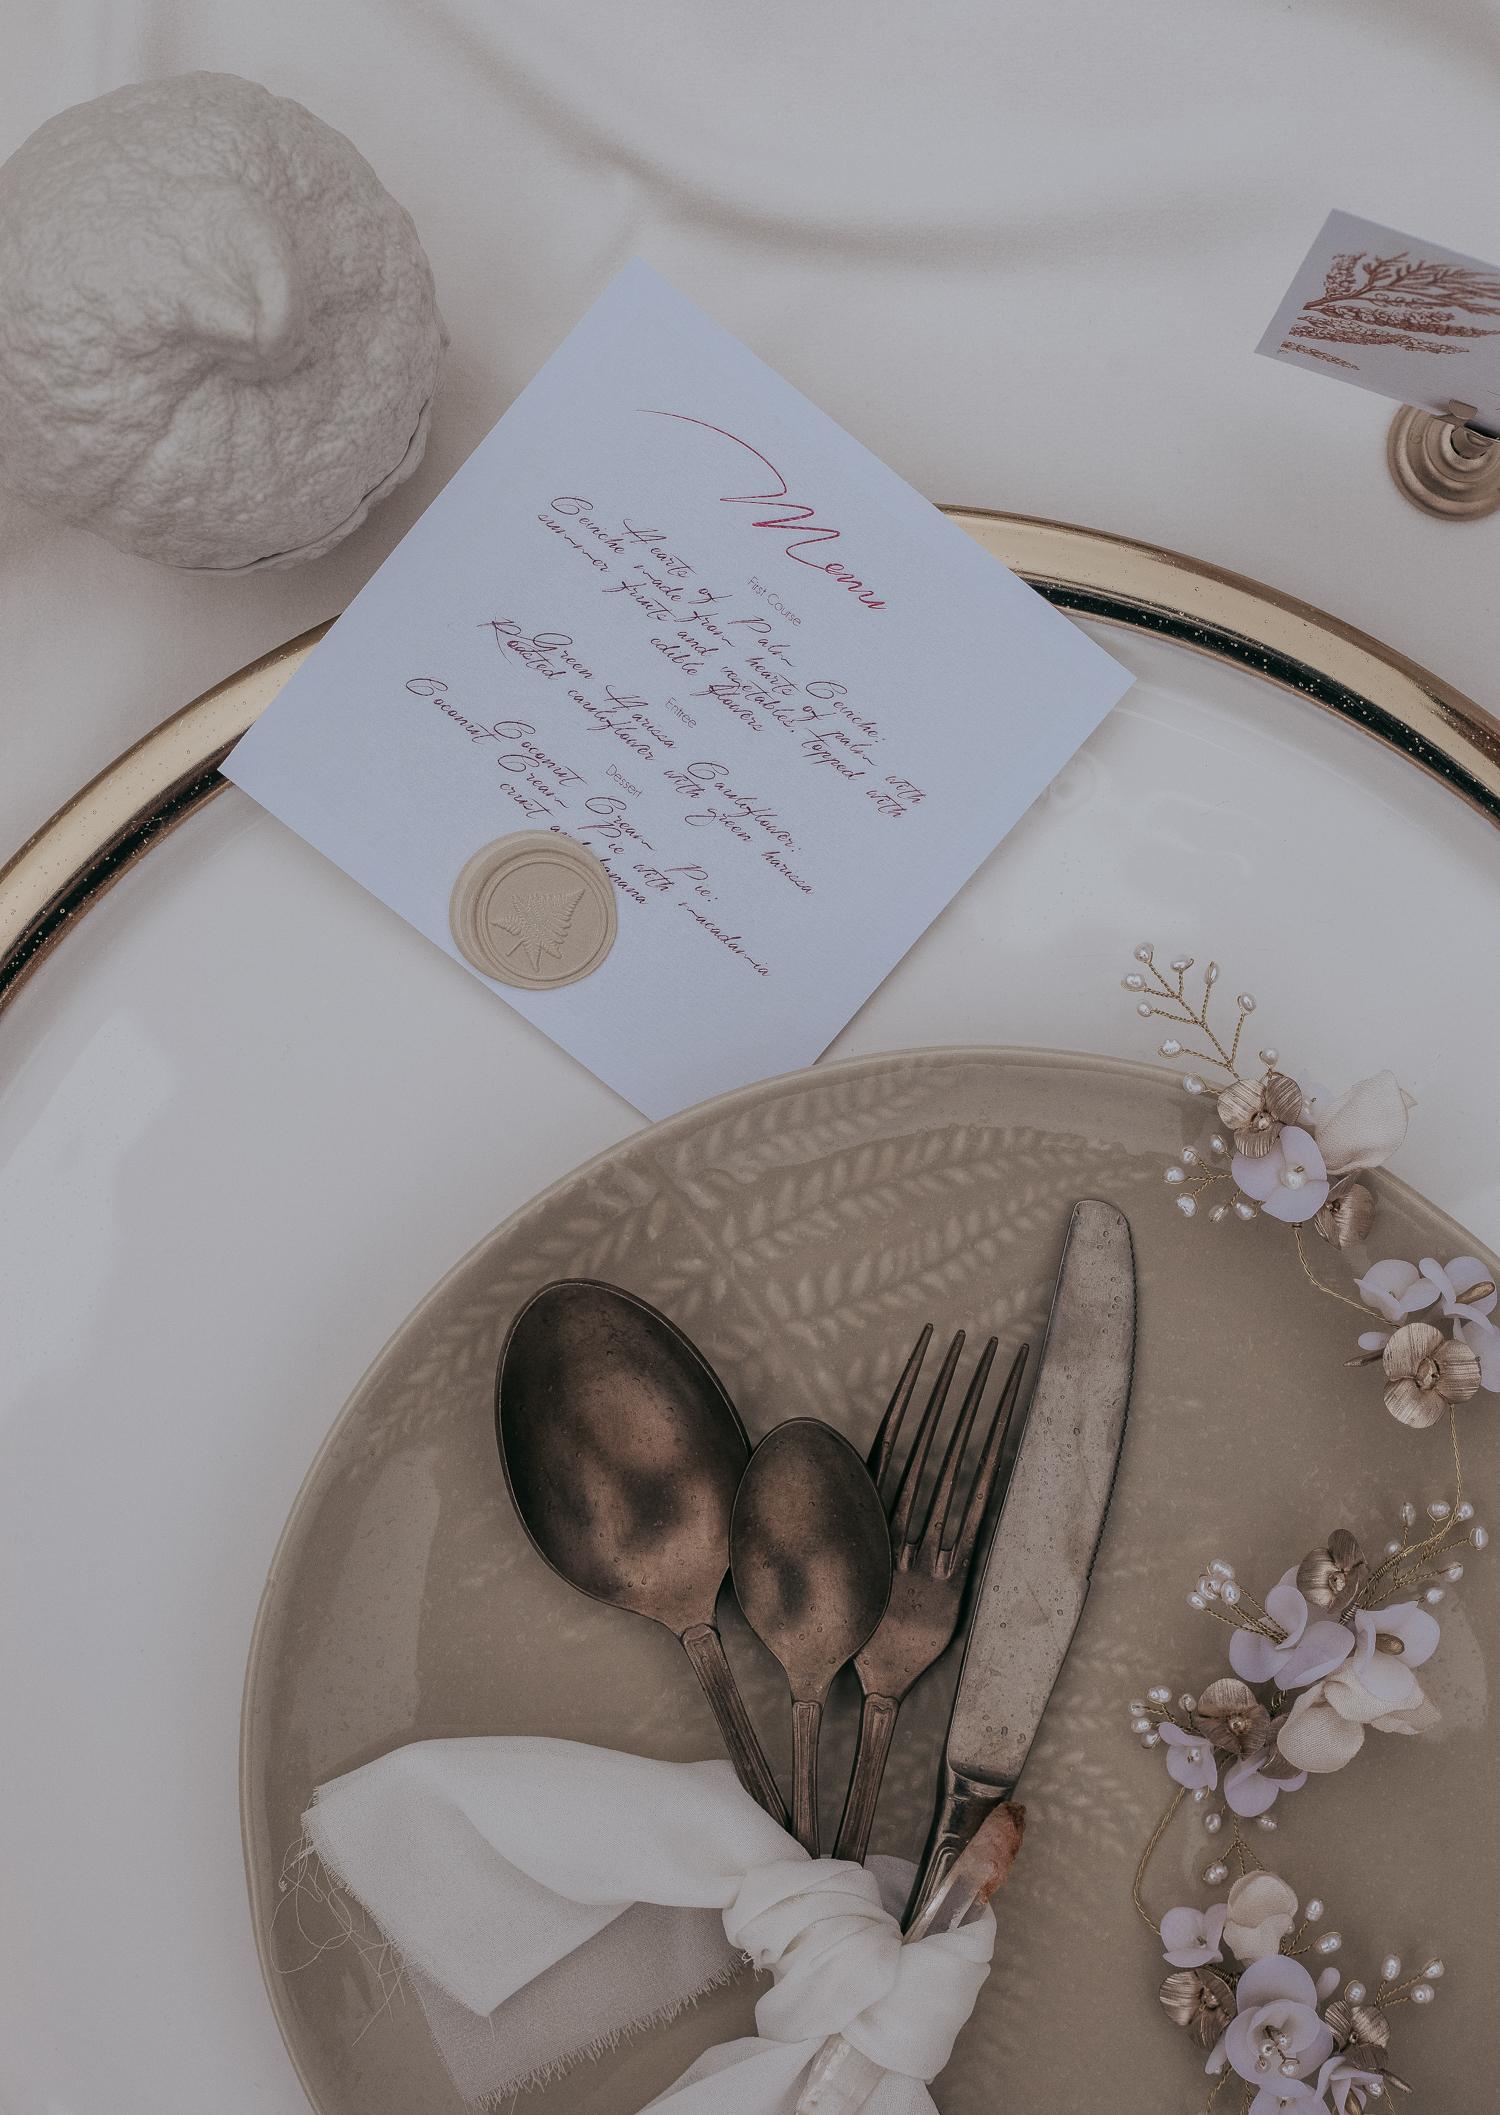 portugal-wedding-photographer-styled-shoot-with-diana-martin-earth-tones-menu-card.jpg